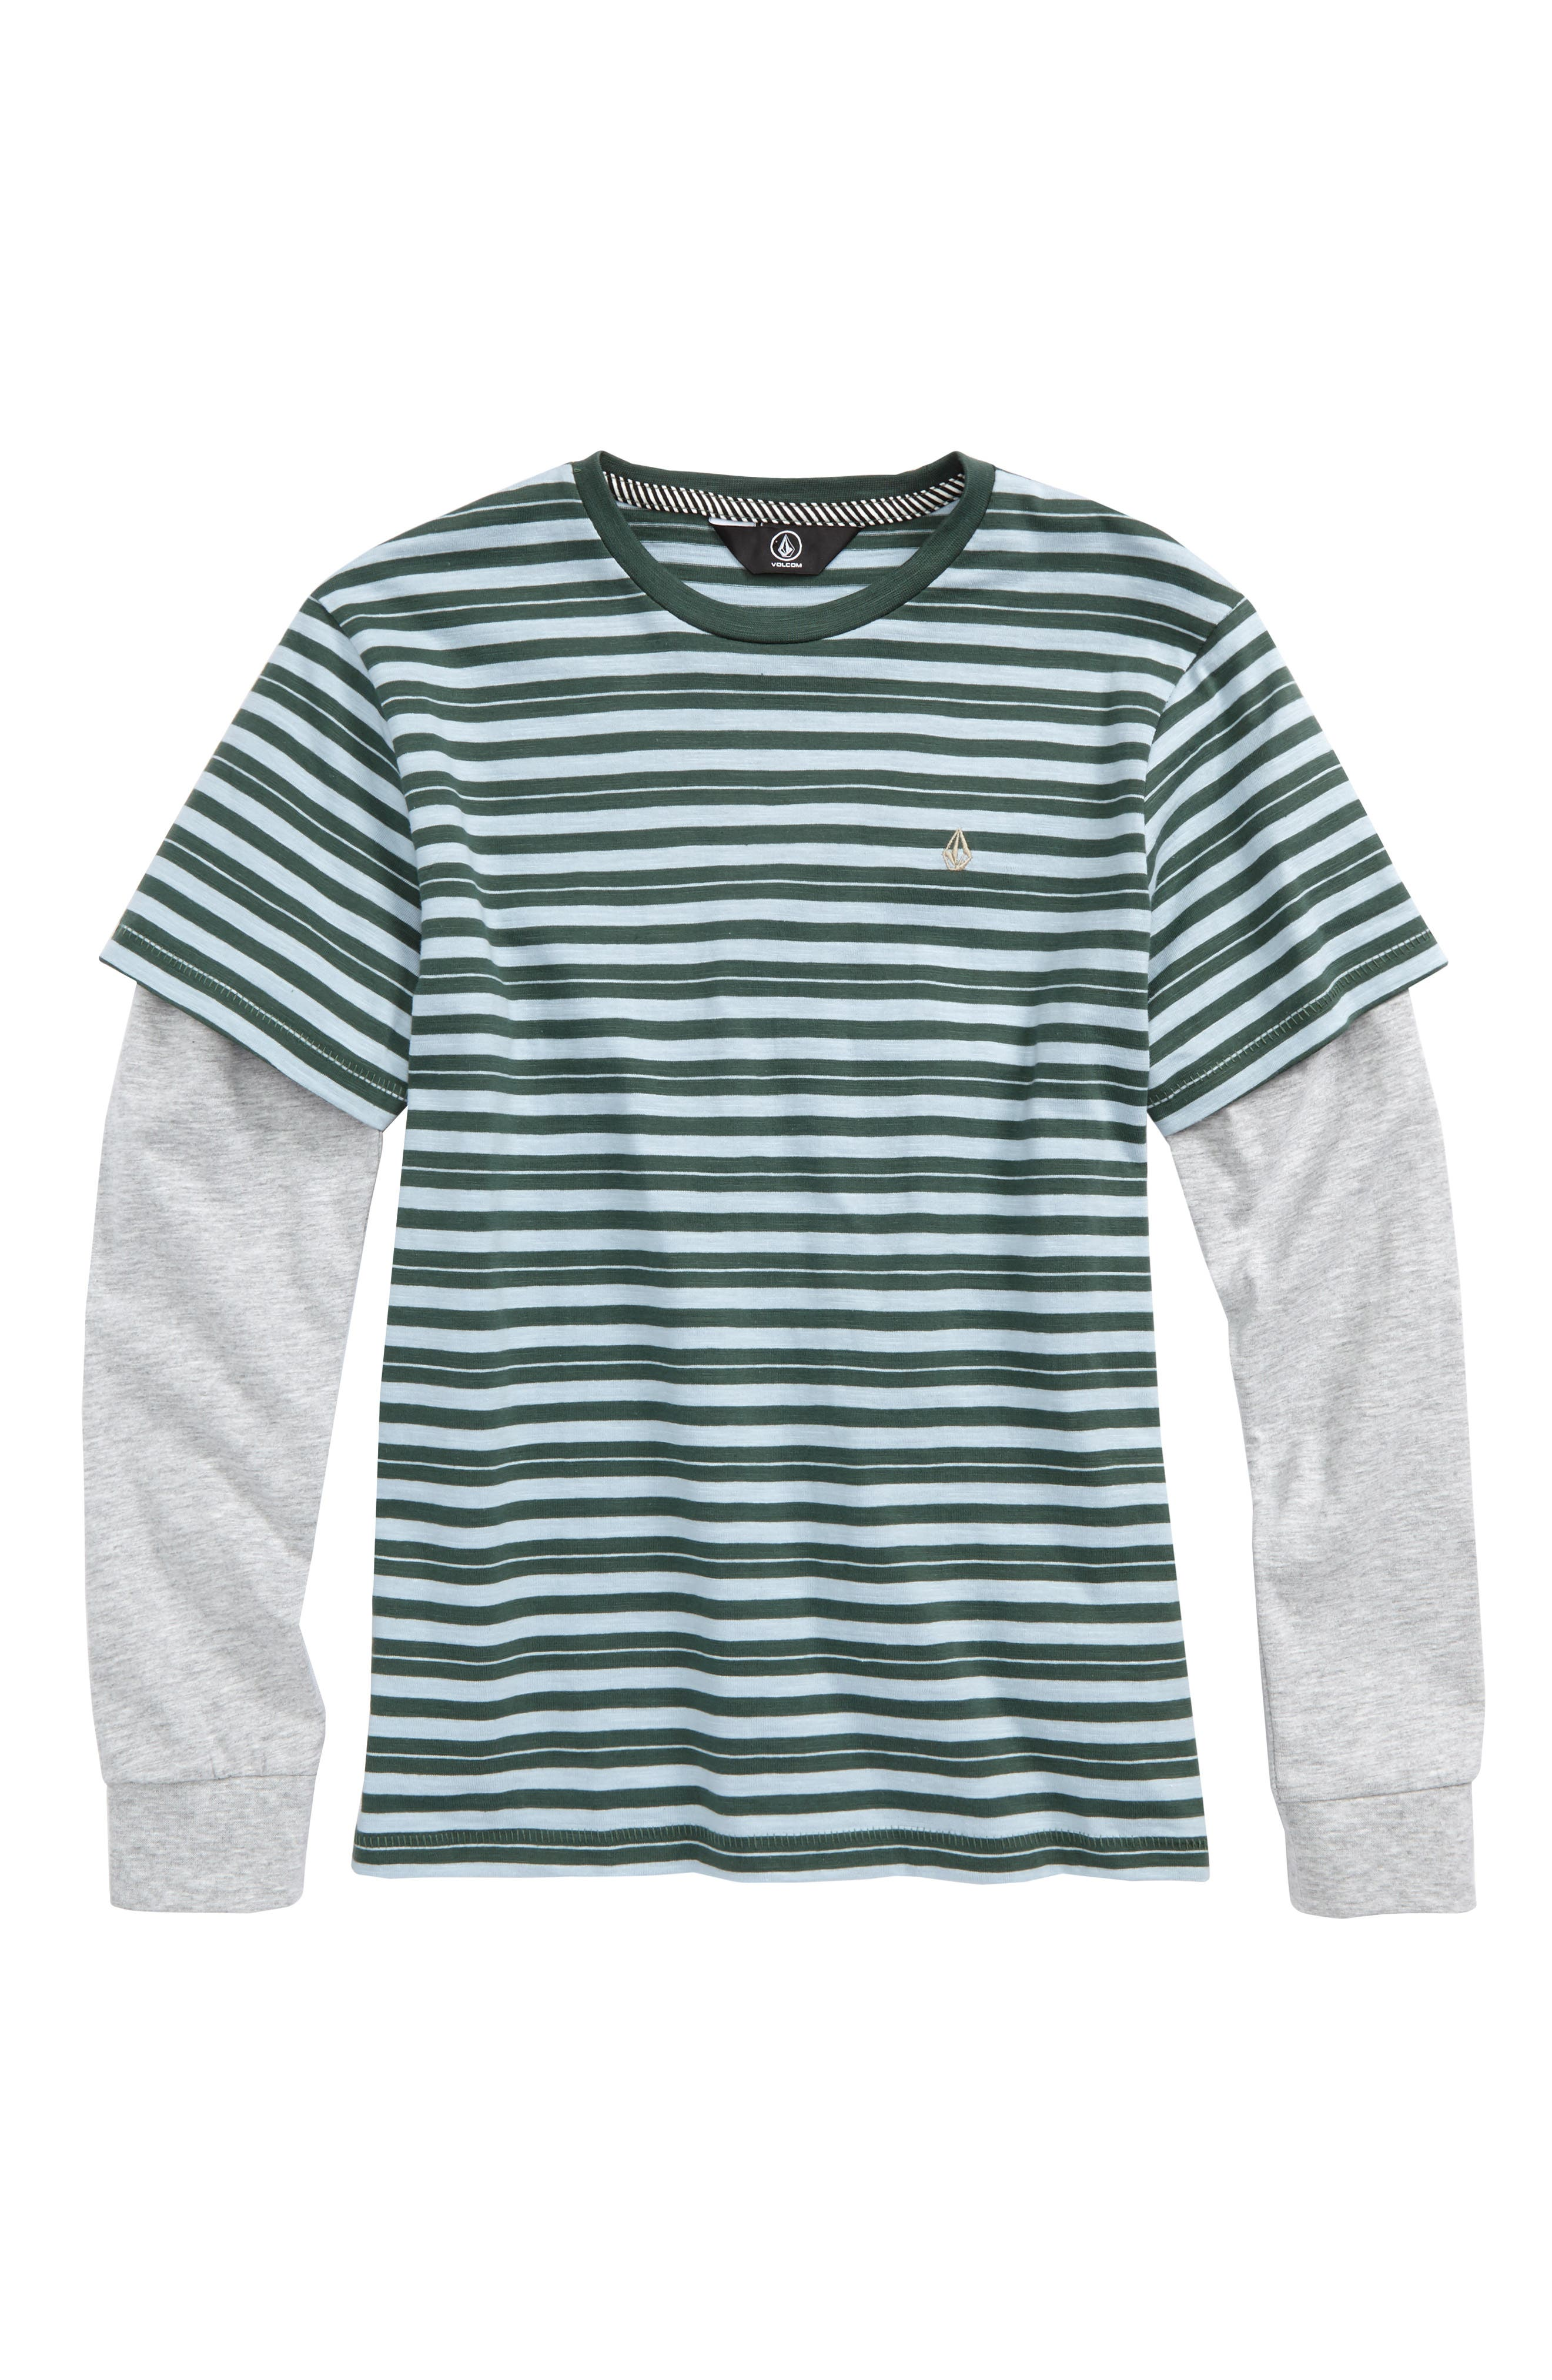 Alternate Image 1 Selected - Volcom Impact Twofer Layered T-Shirt (Big Boys)